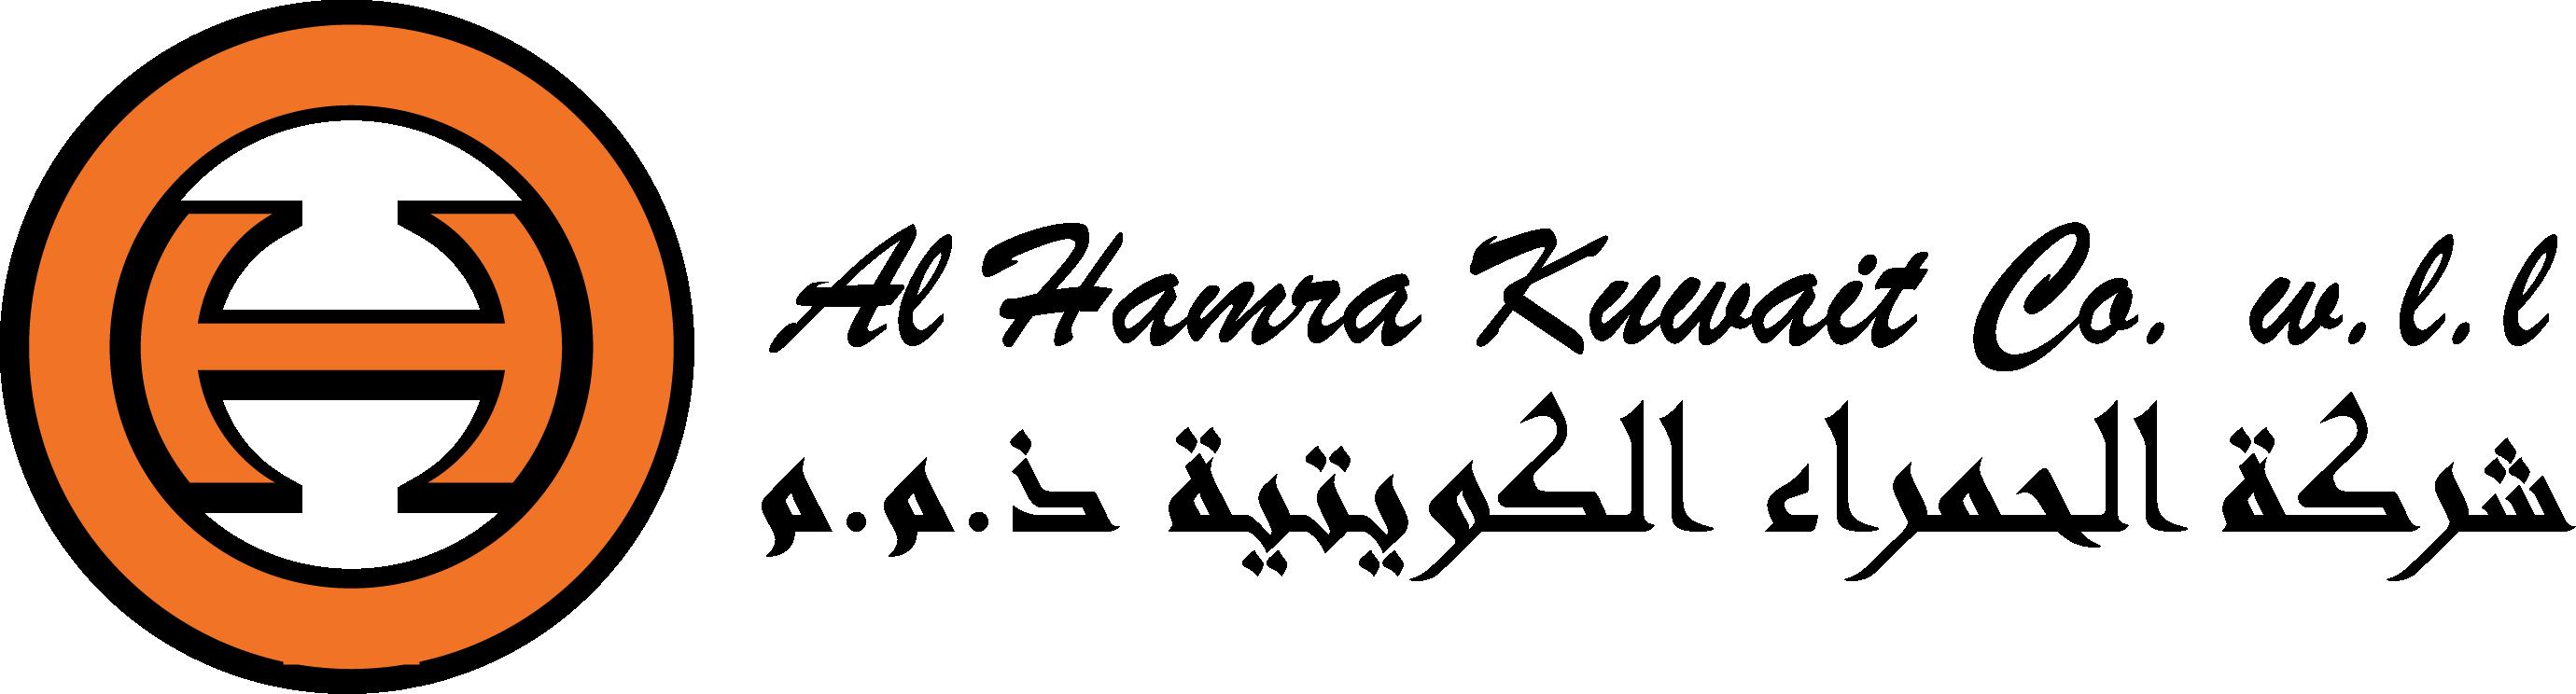 AL HAMRA CONSTRUCTION CO